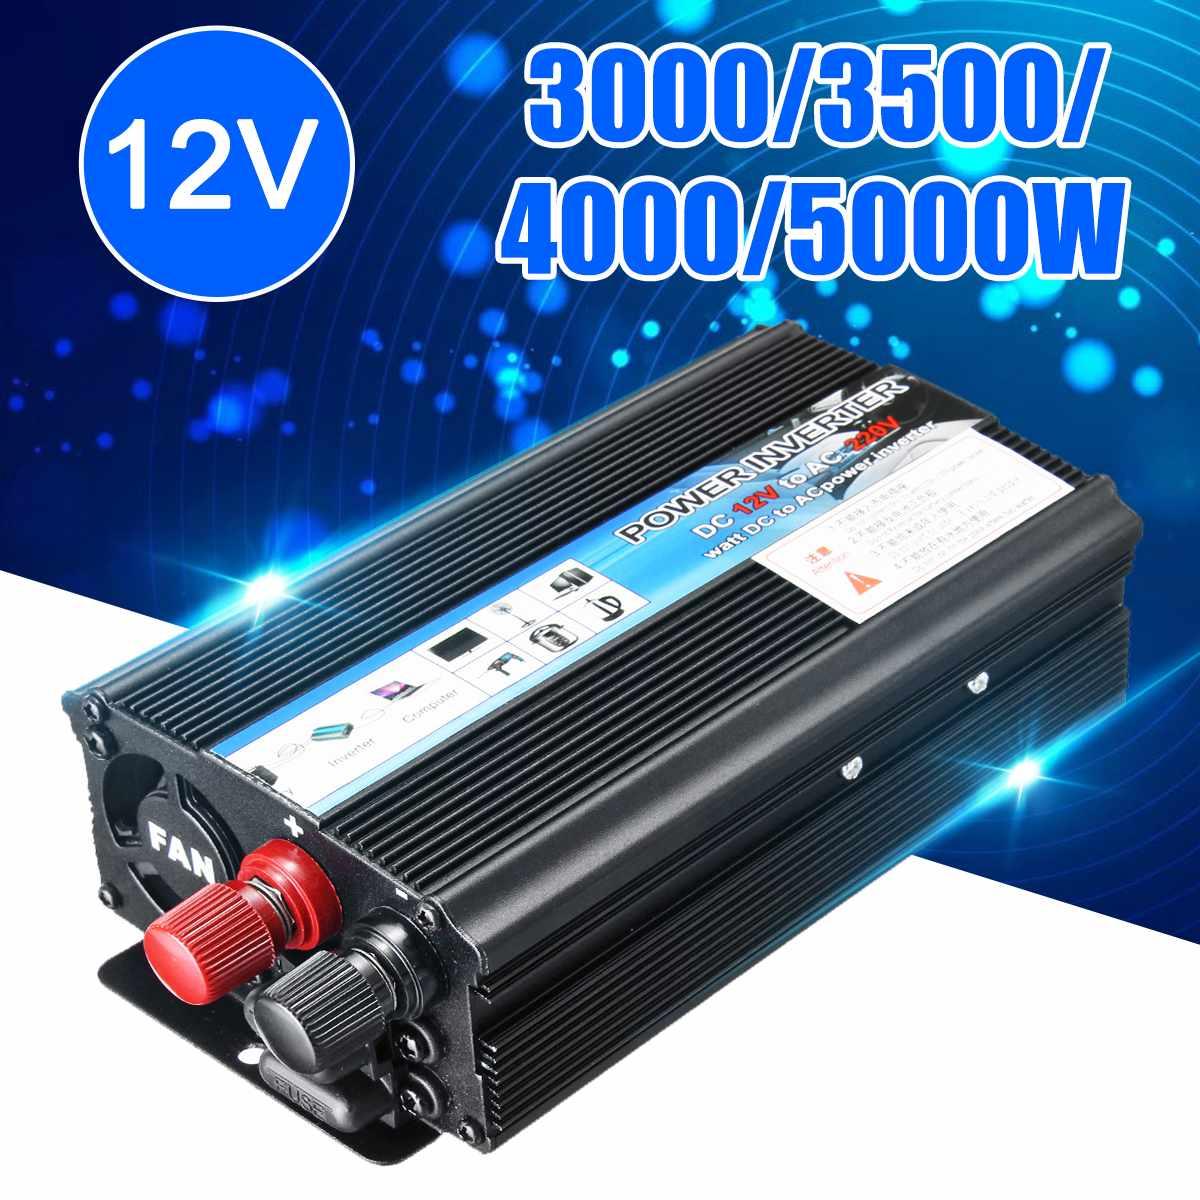 4000W//5000W Car Power Inverter Modified Sine Wave WATT 12V to AC 110V Converter